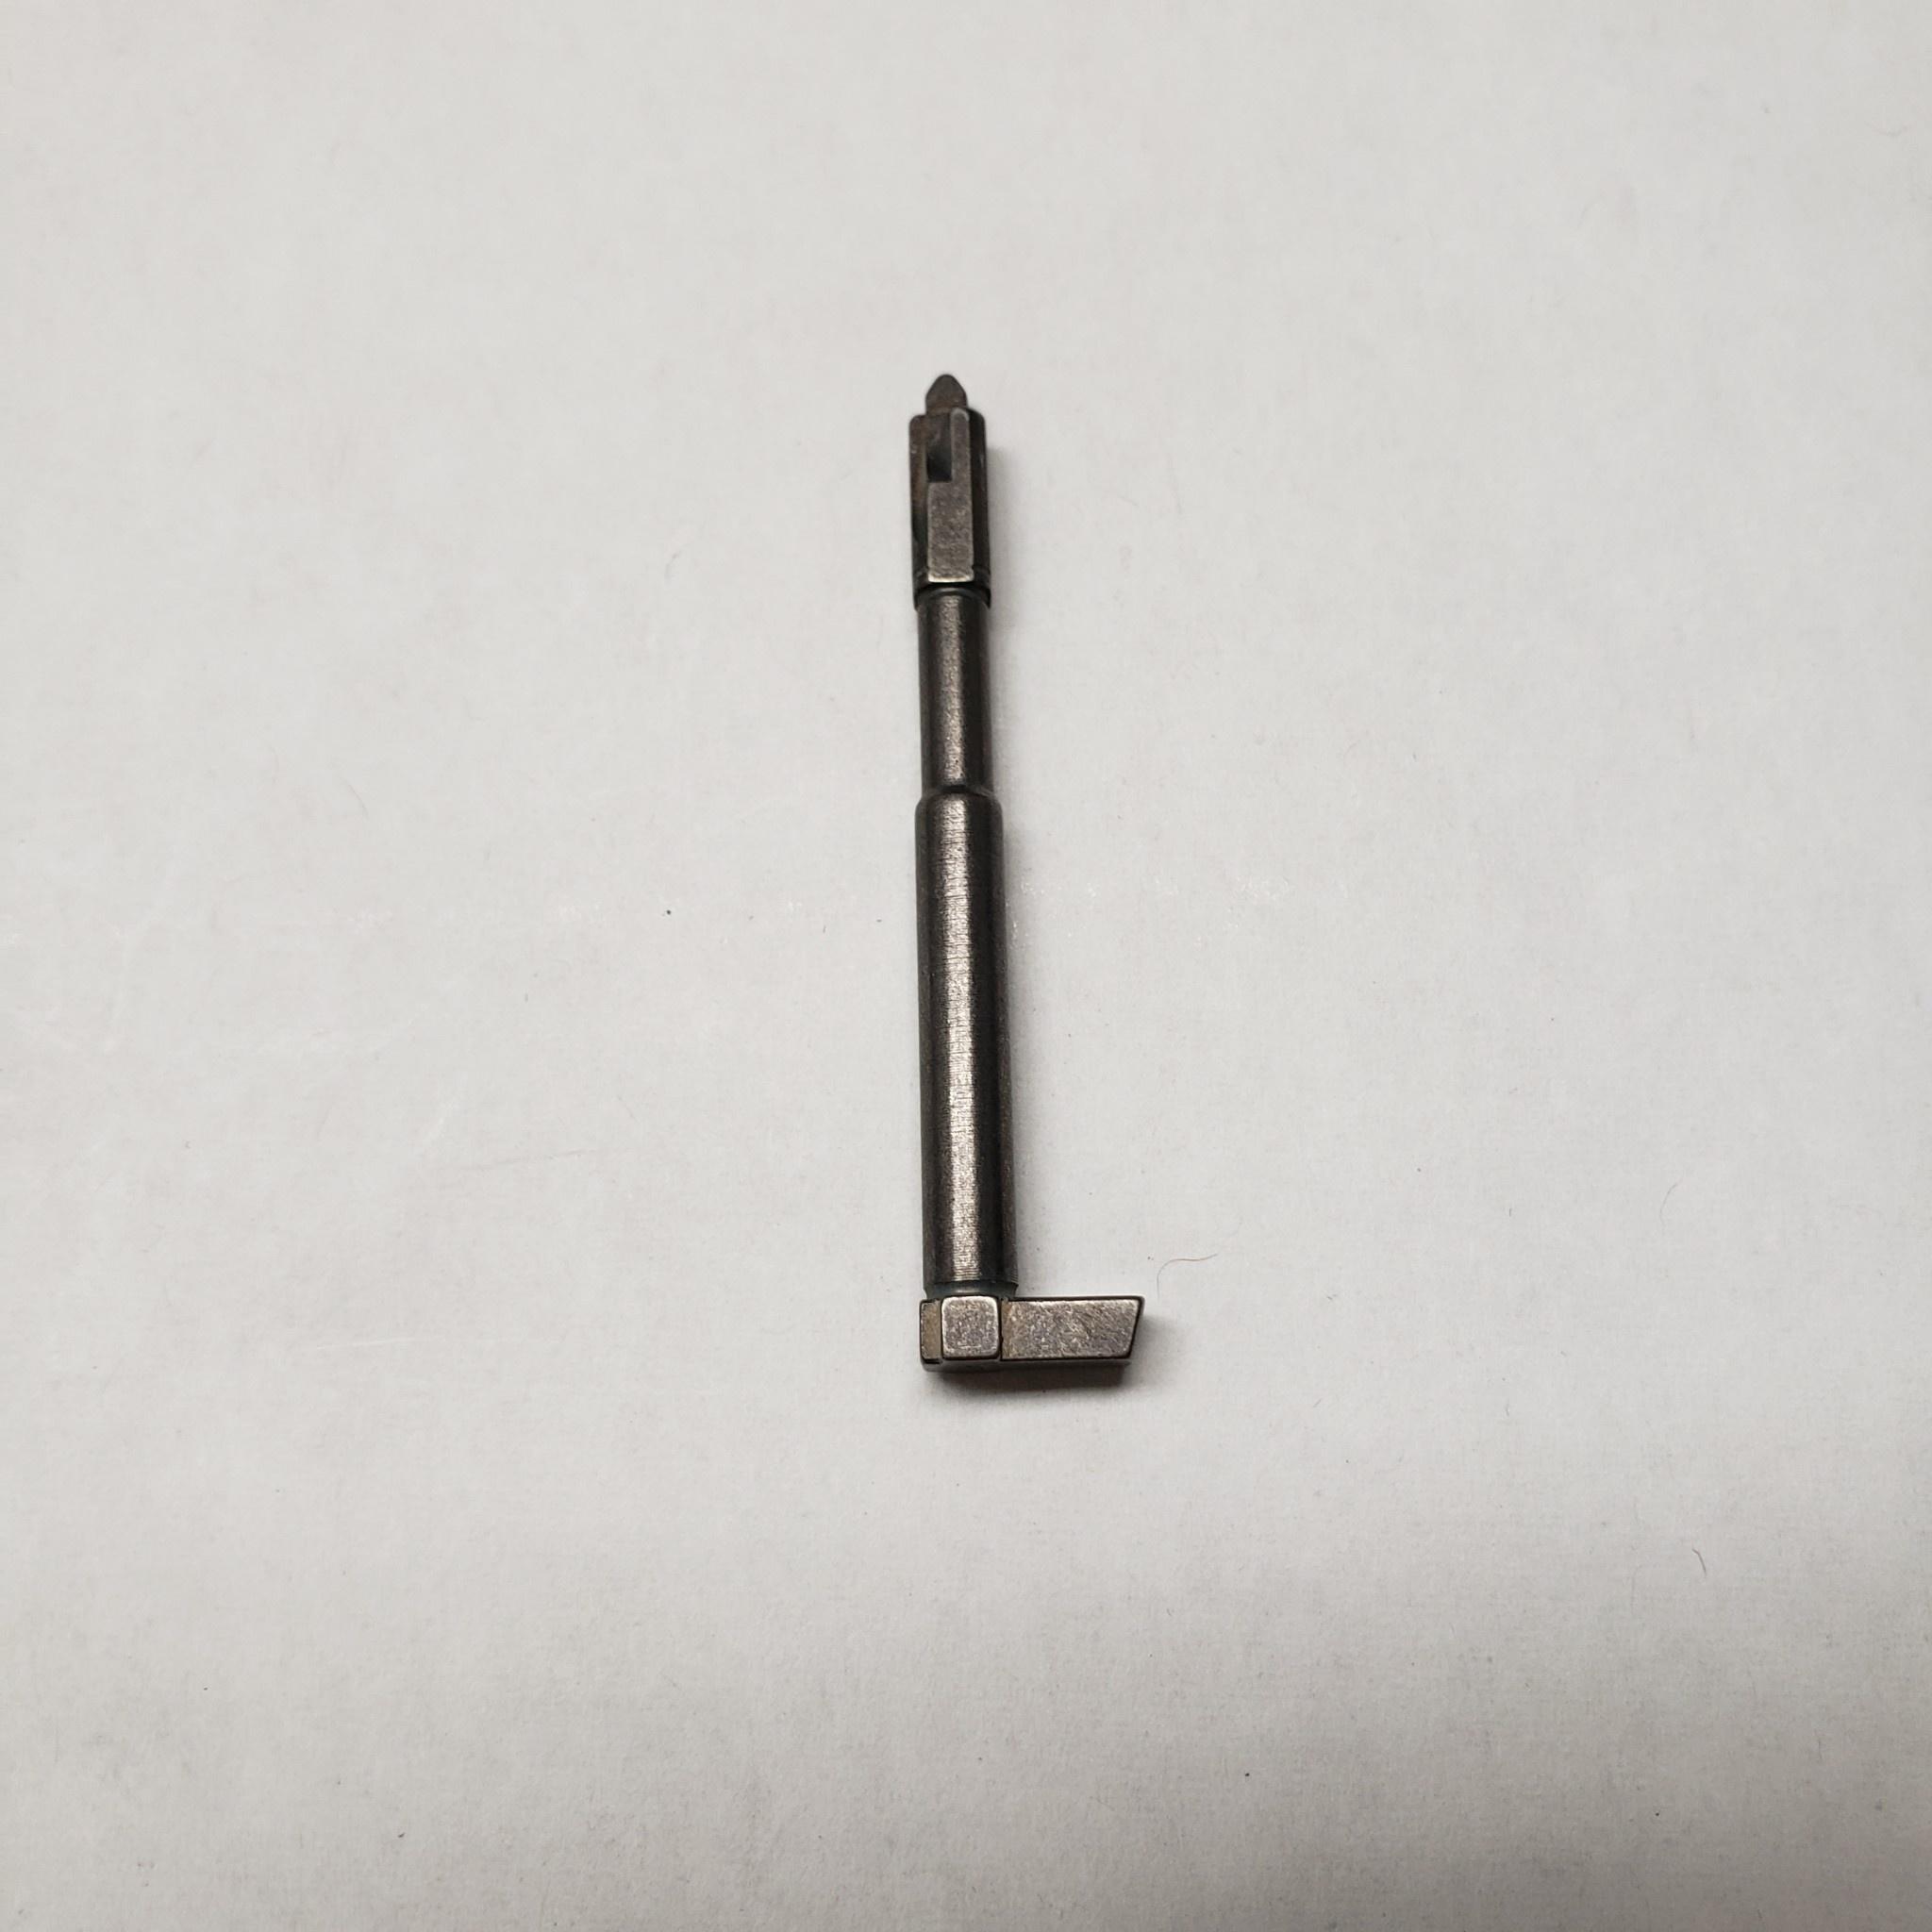 Glock OEM Firing Pin 9mm